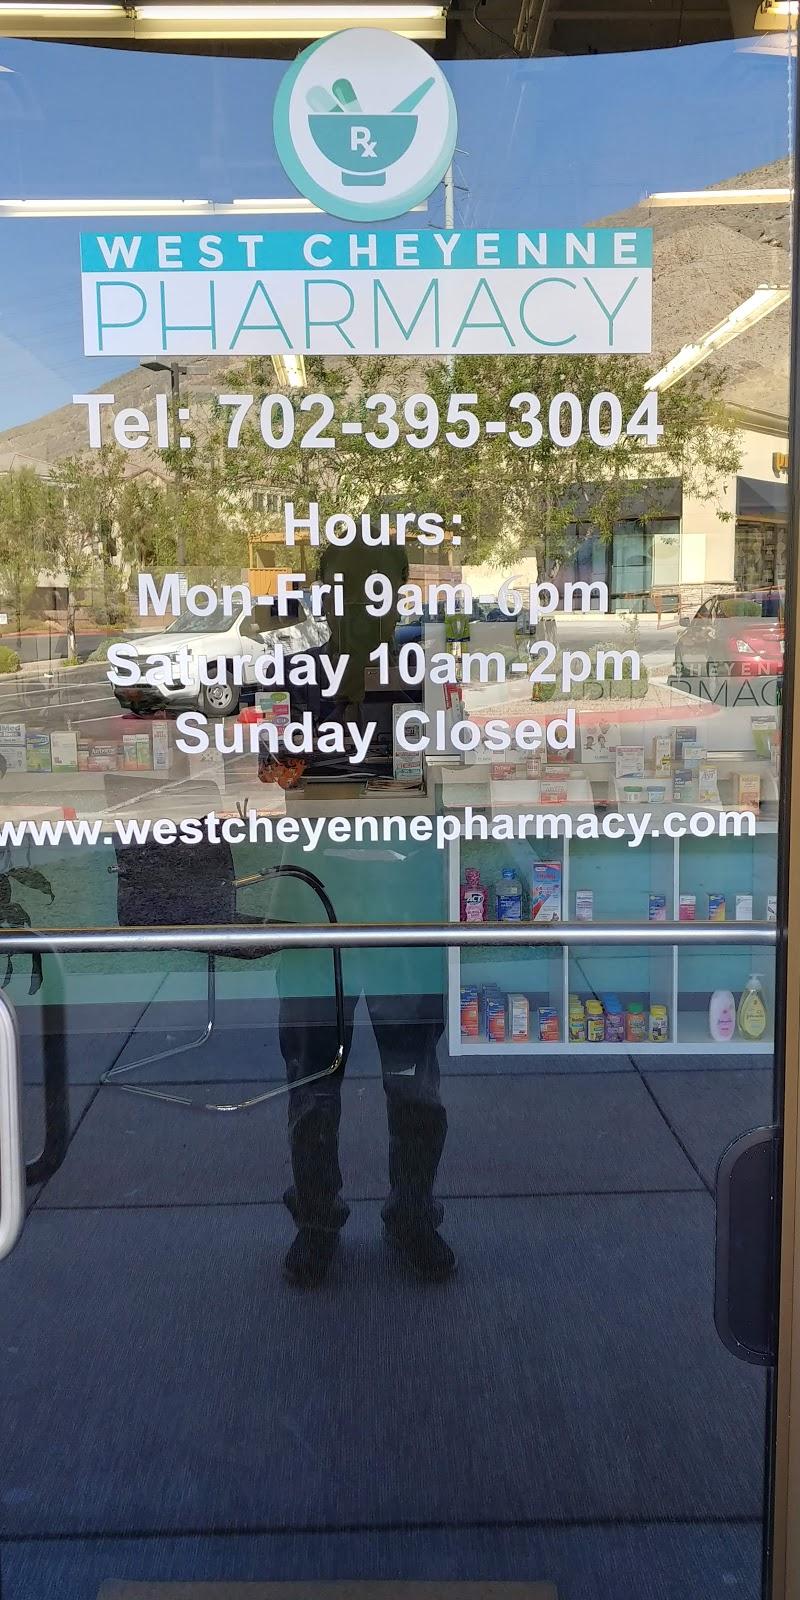 West Cheyenne Pharmacy - pharmacy    Photo 8 of 8   Address: 3350 Novat St suite 110, Las Vegas, NV 89129, USA   Phone: (702) 395-3004